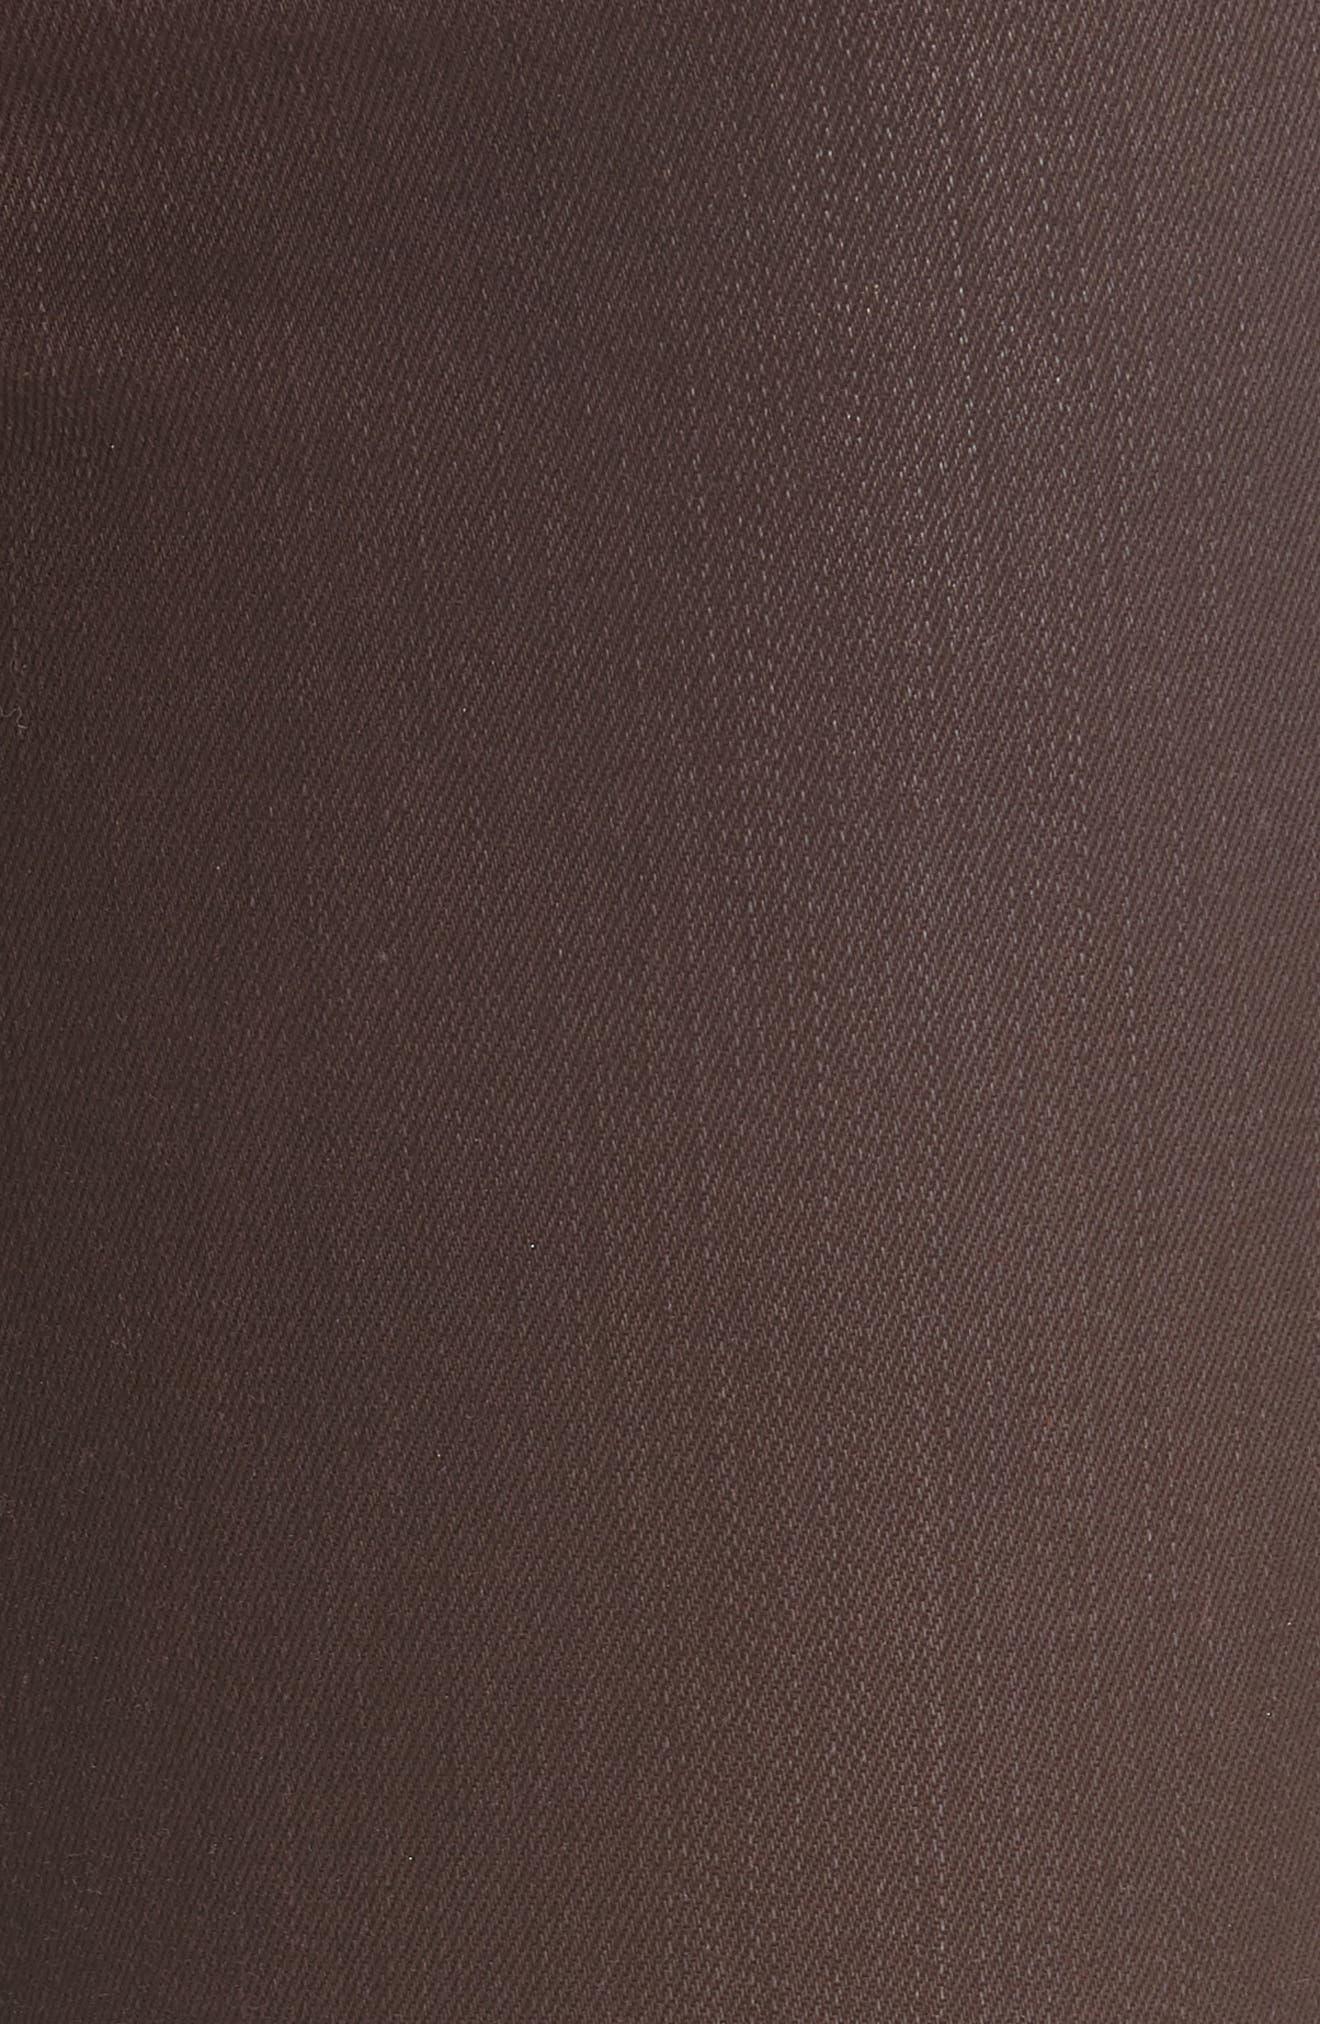 AO.LA Good High Waist Ankle Skinny Jeans,                             Alternate thumbnail 5, color,                             WINE/ BUBBLEGUM